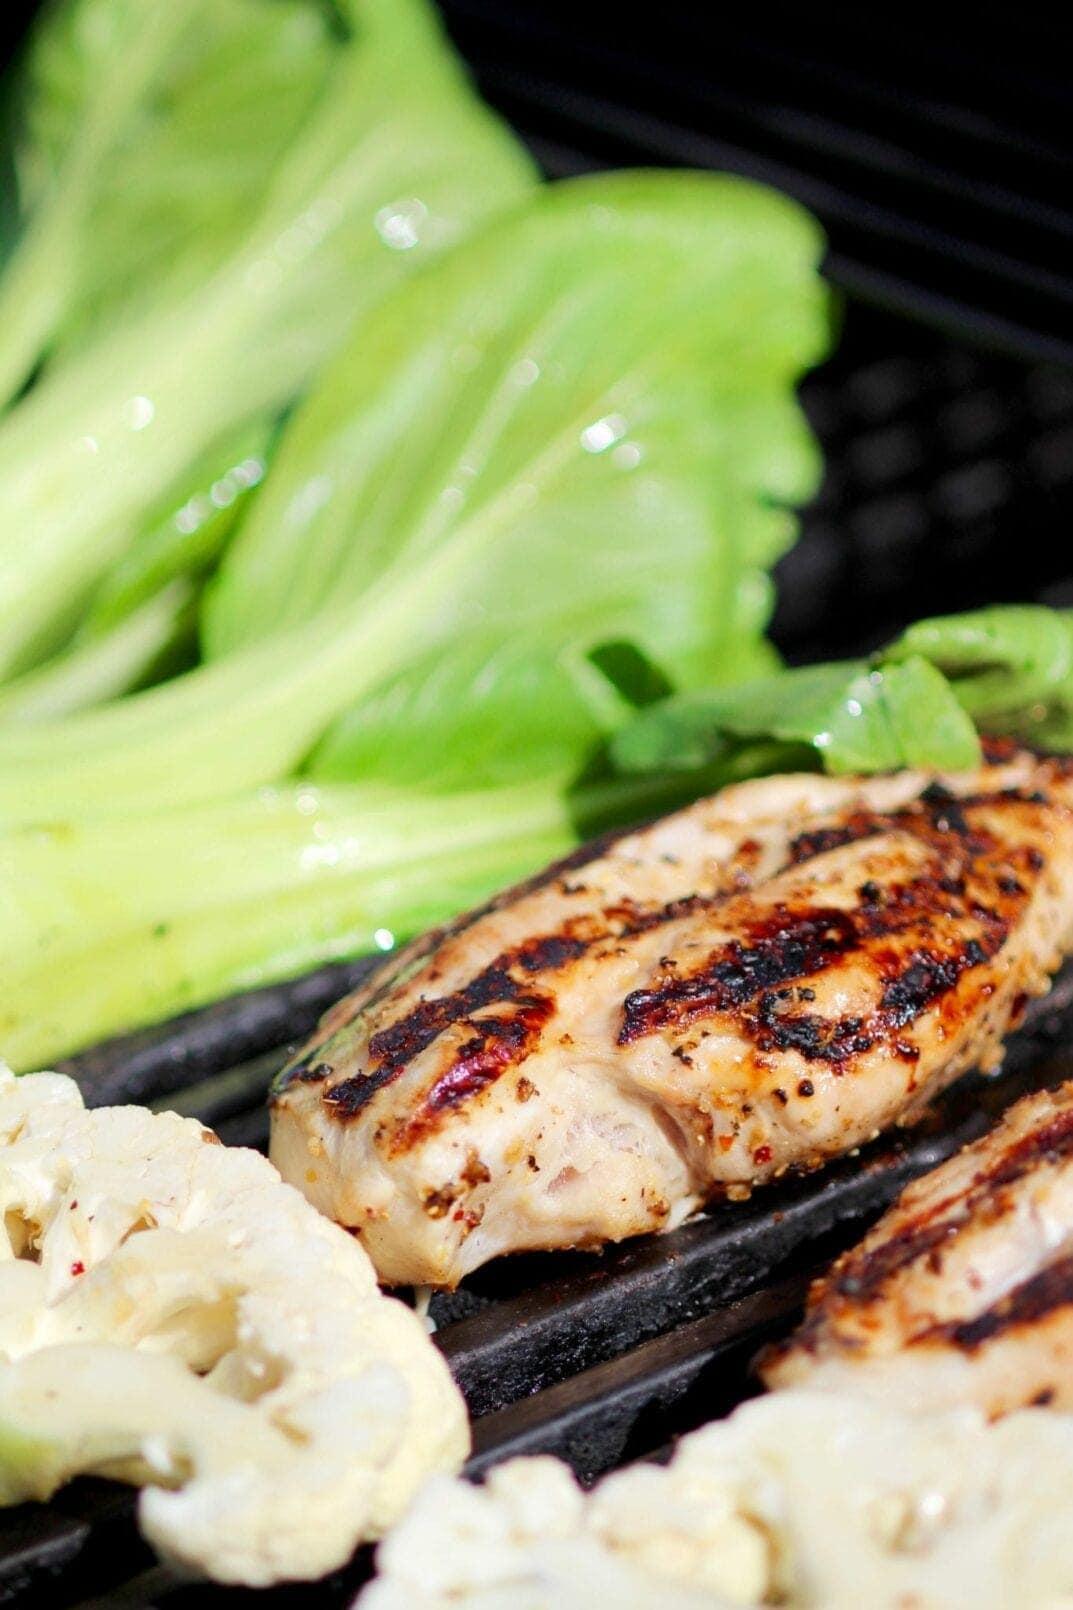 grilled bok choy + sesame chicken dinner | www.nourishmovelove.com